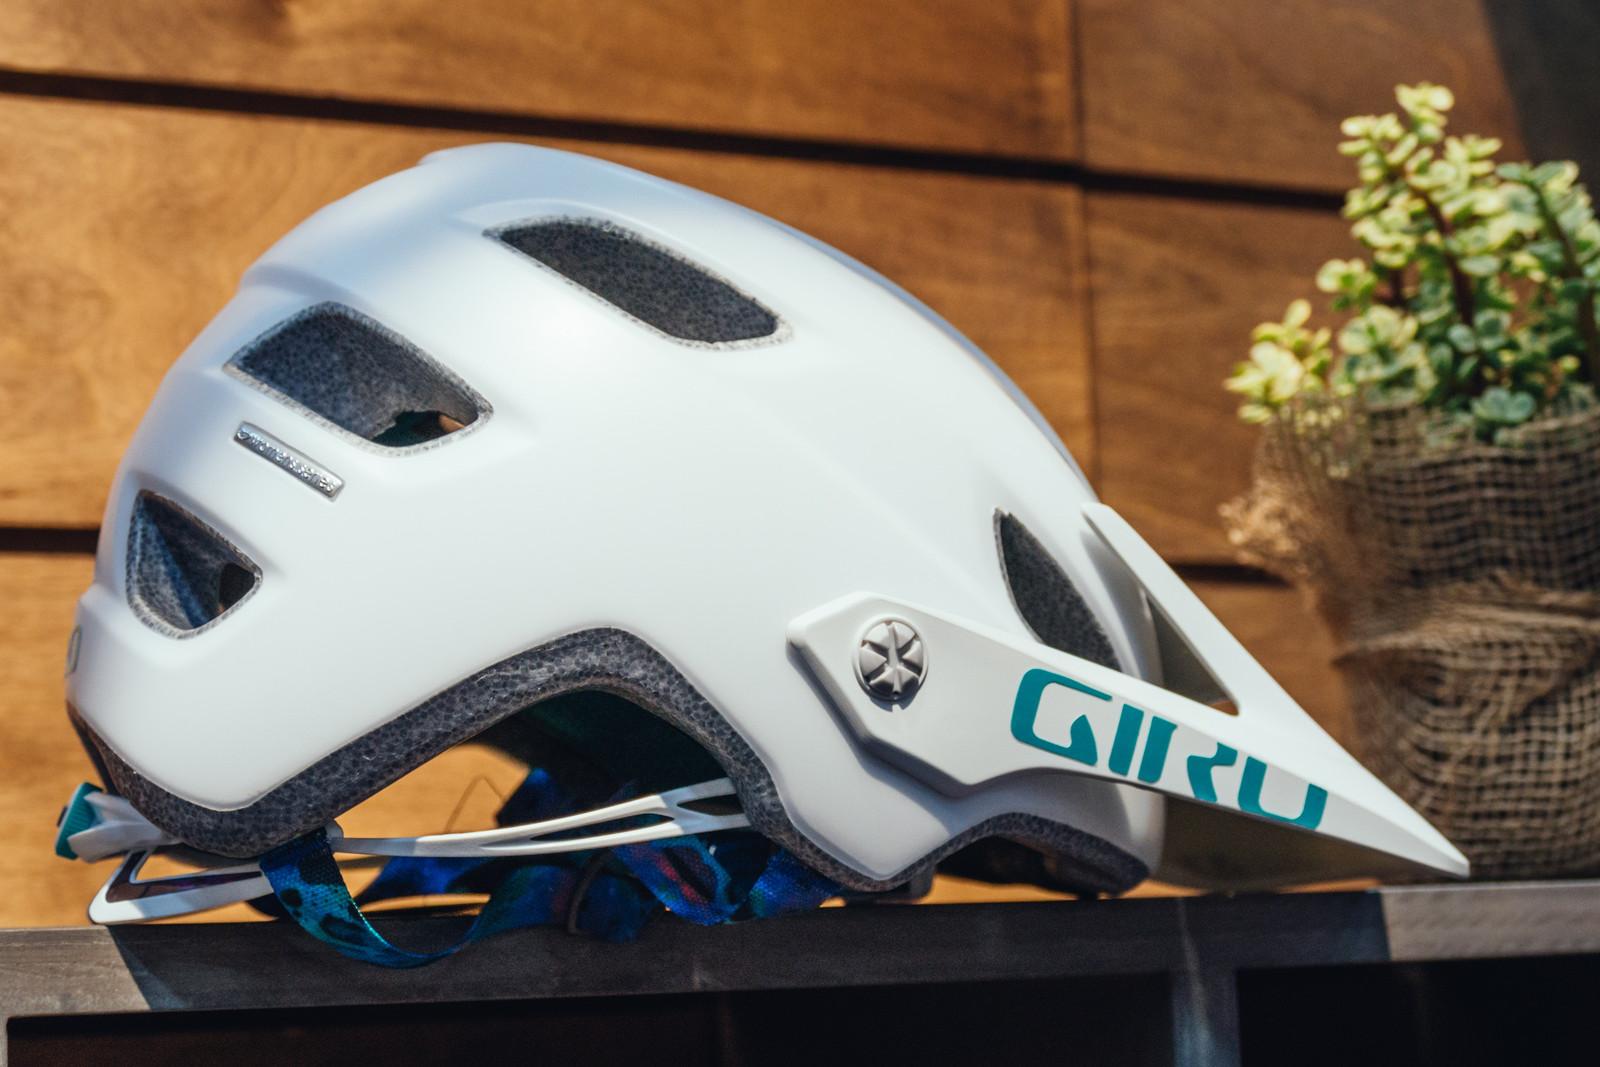 2017 Giro Helmets, Apparel and Shoes - INTERBIKE - 2017 Women's Mountain Bike Gear - Mountain Biking Pictures - Vital MTB